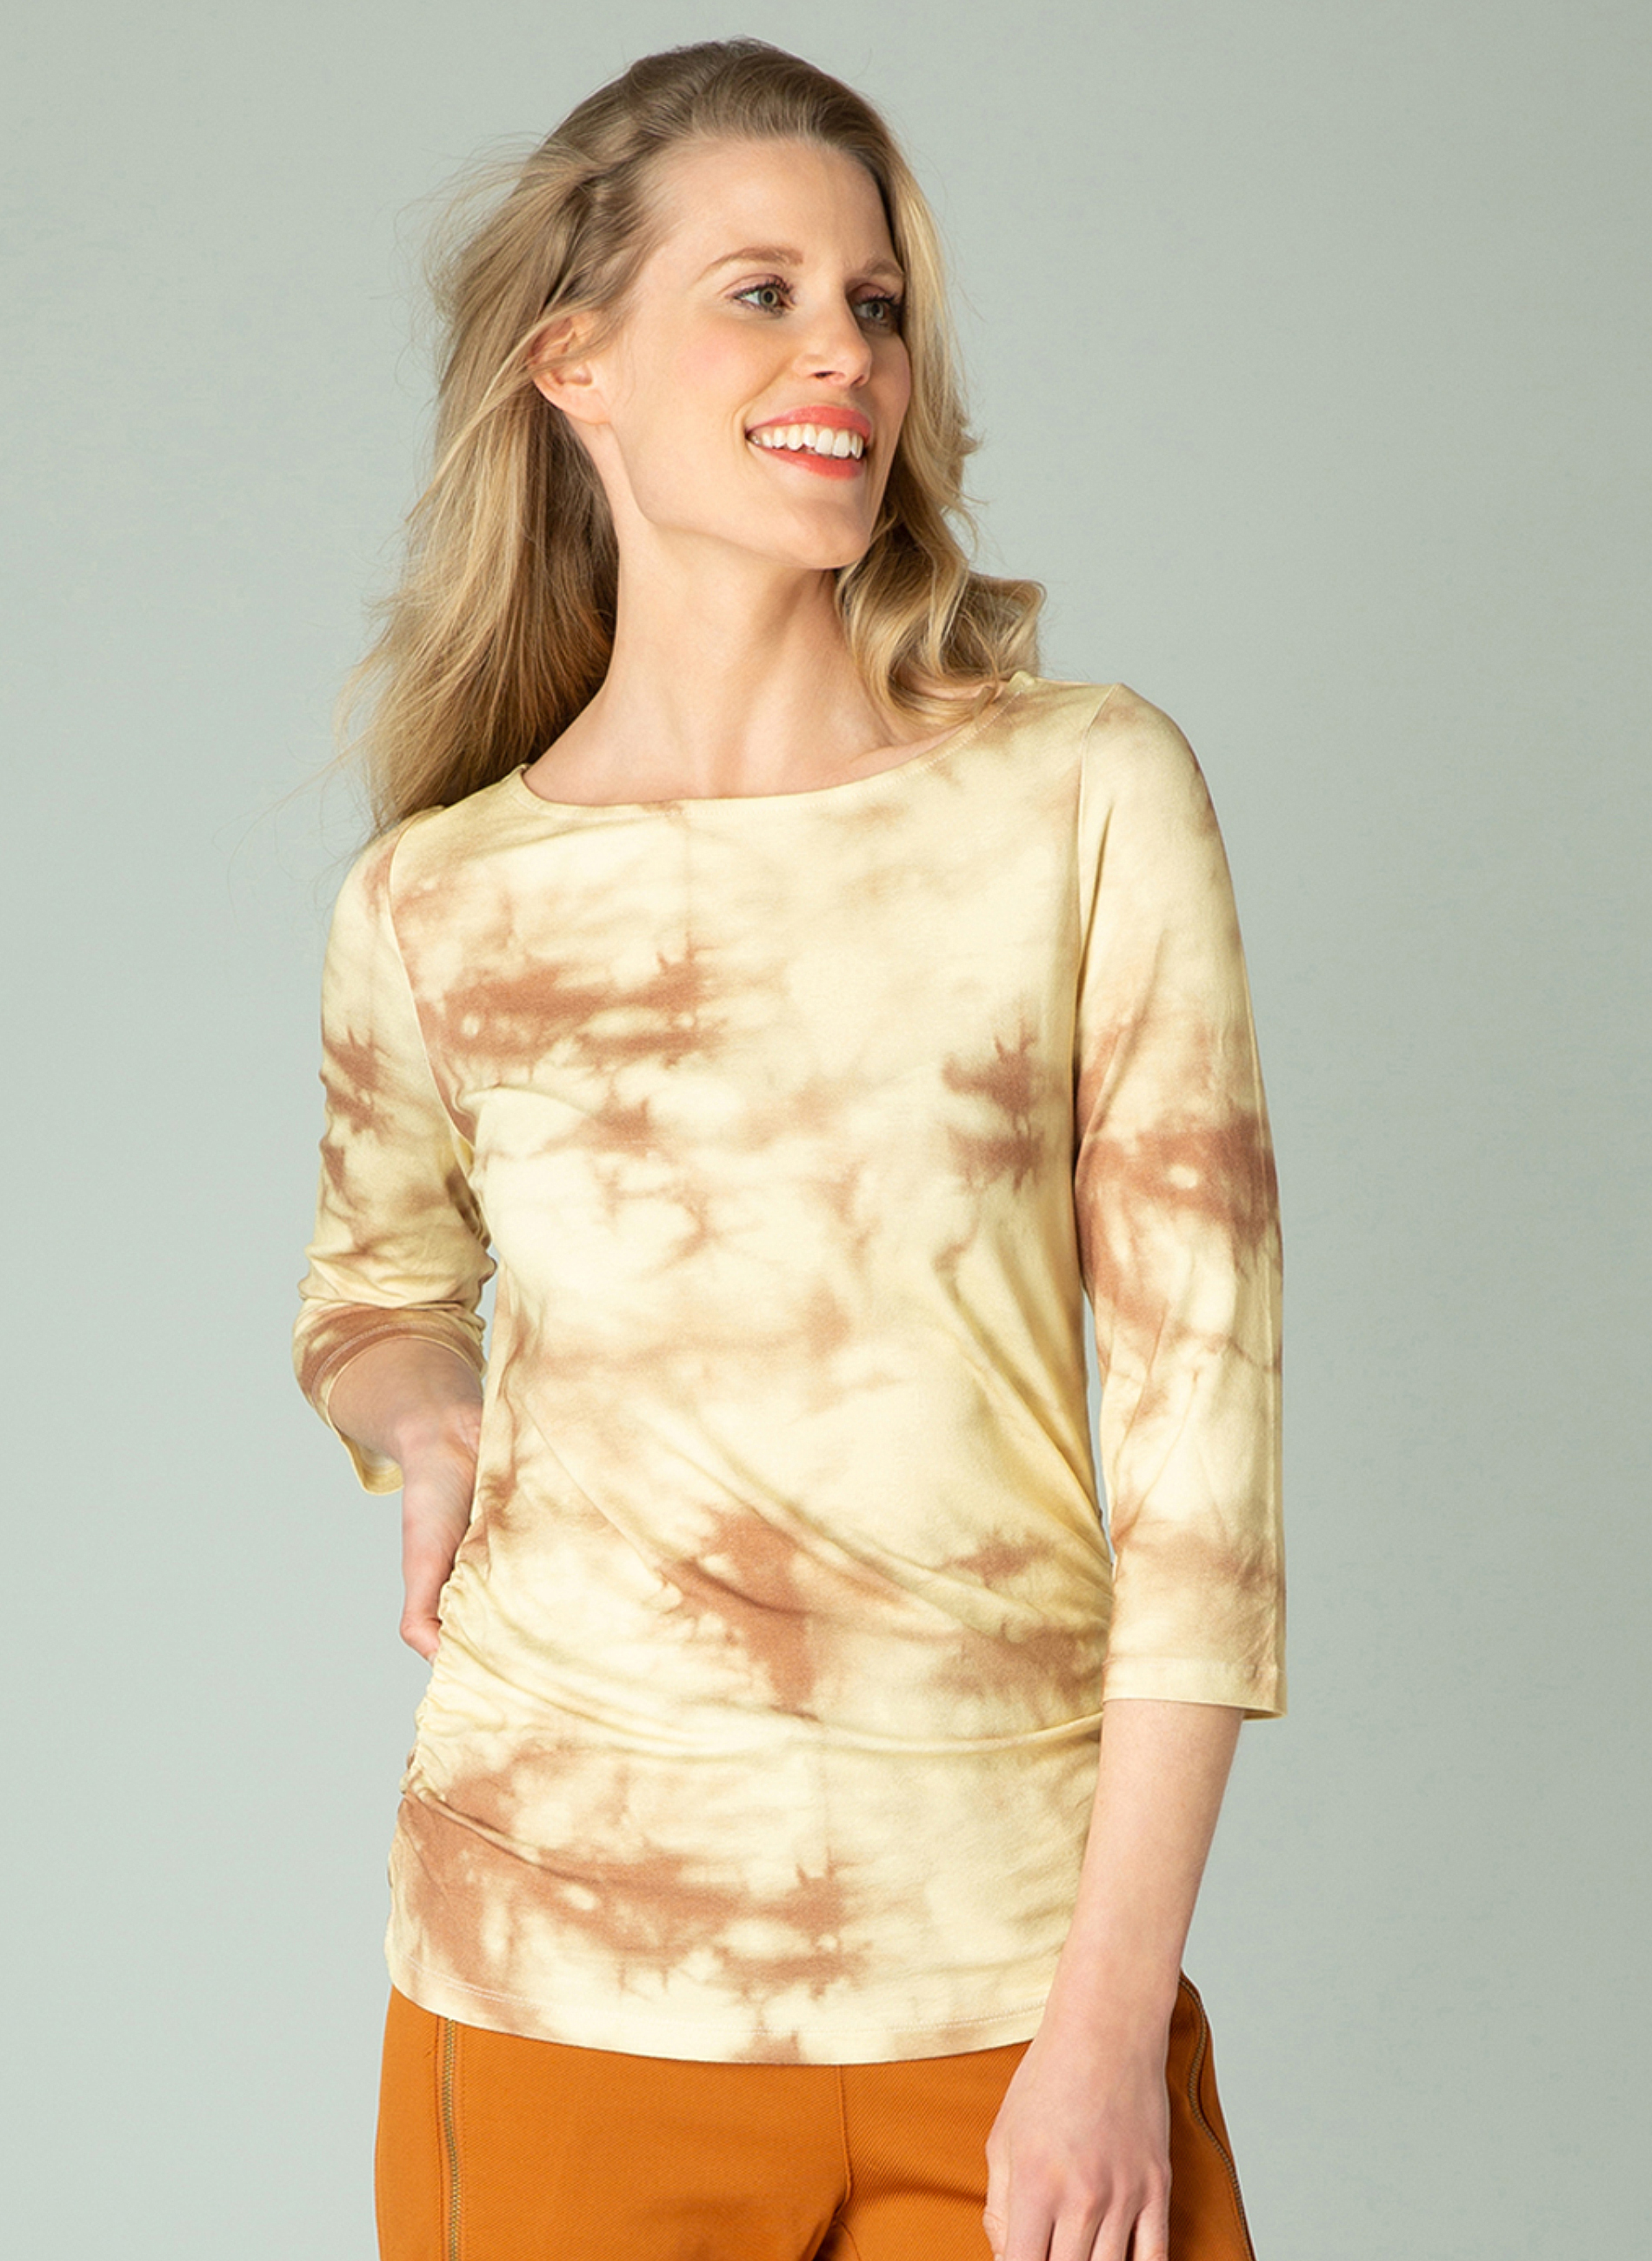 Yest Shirt Gennai 62 cm